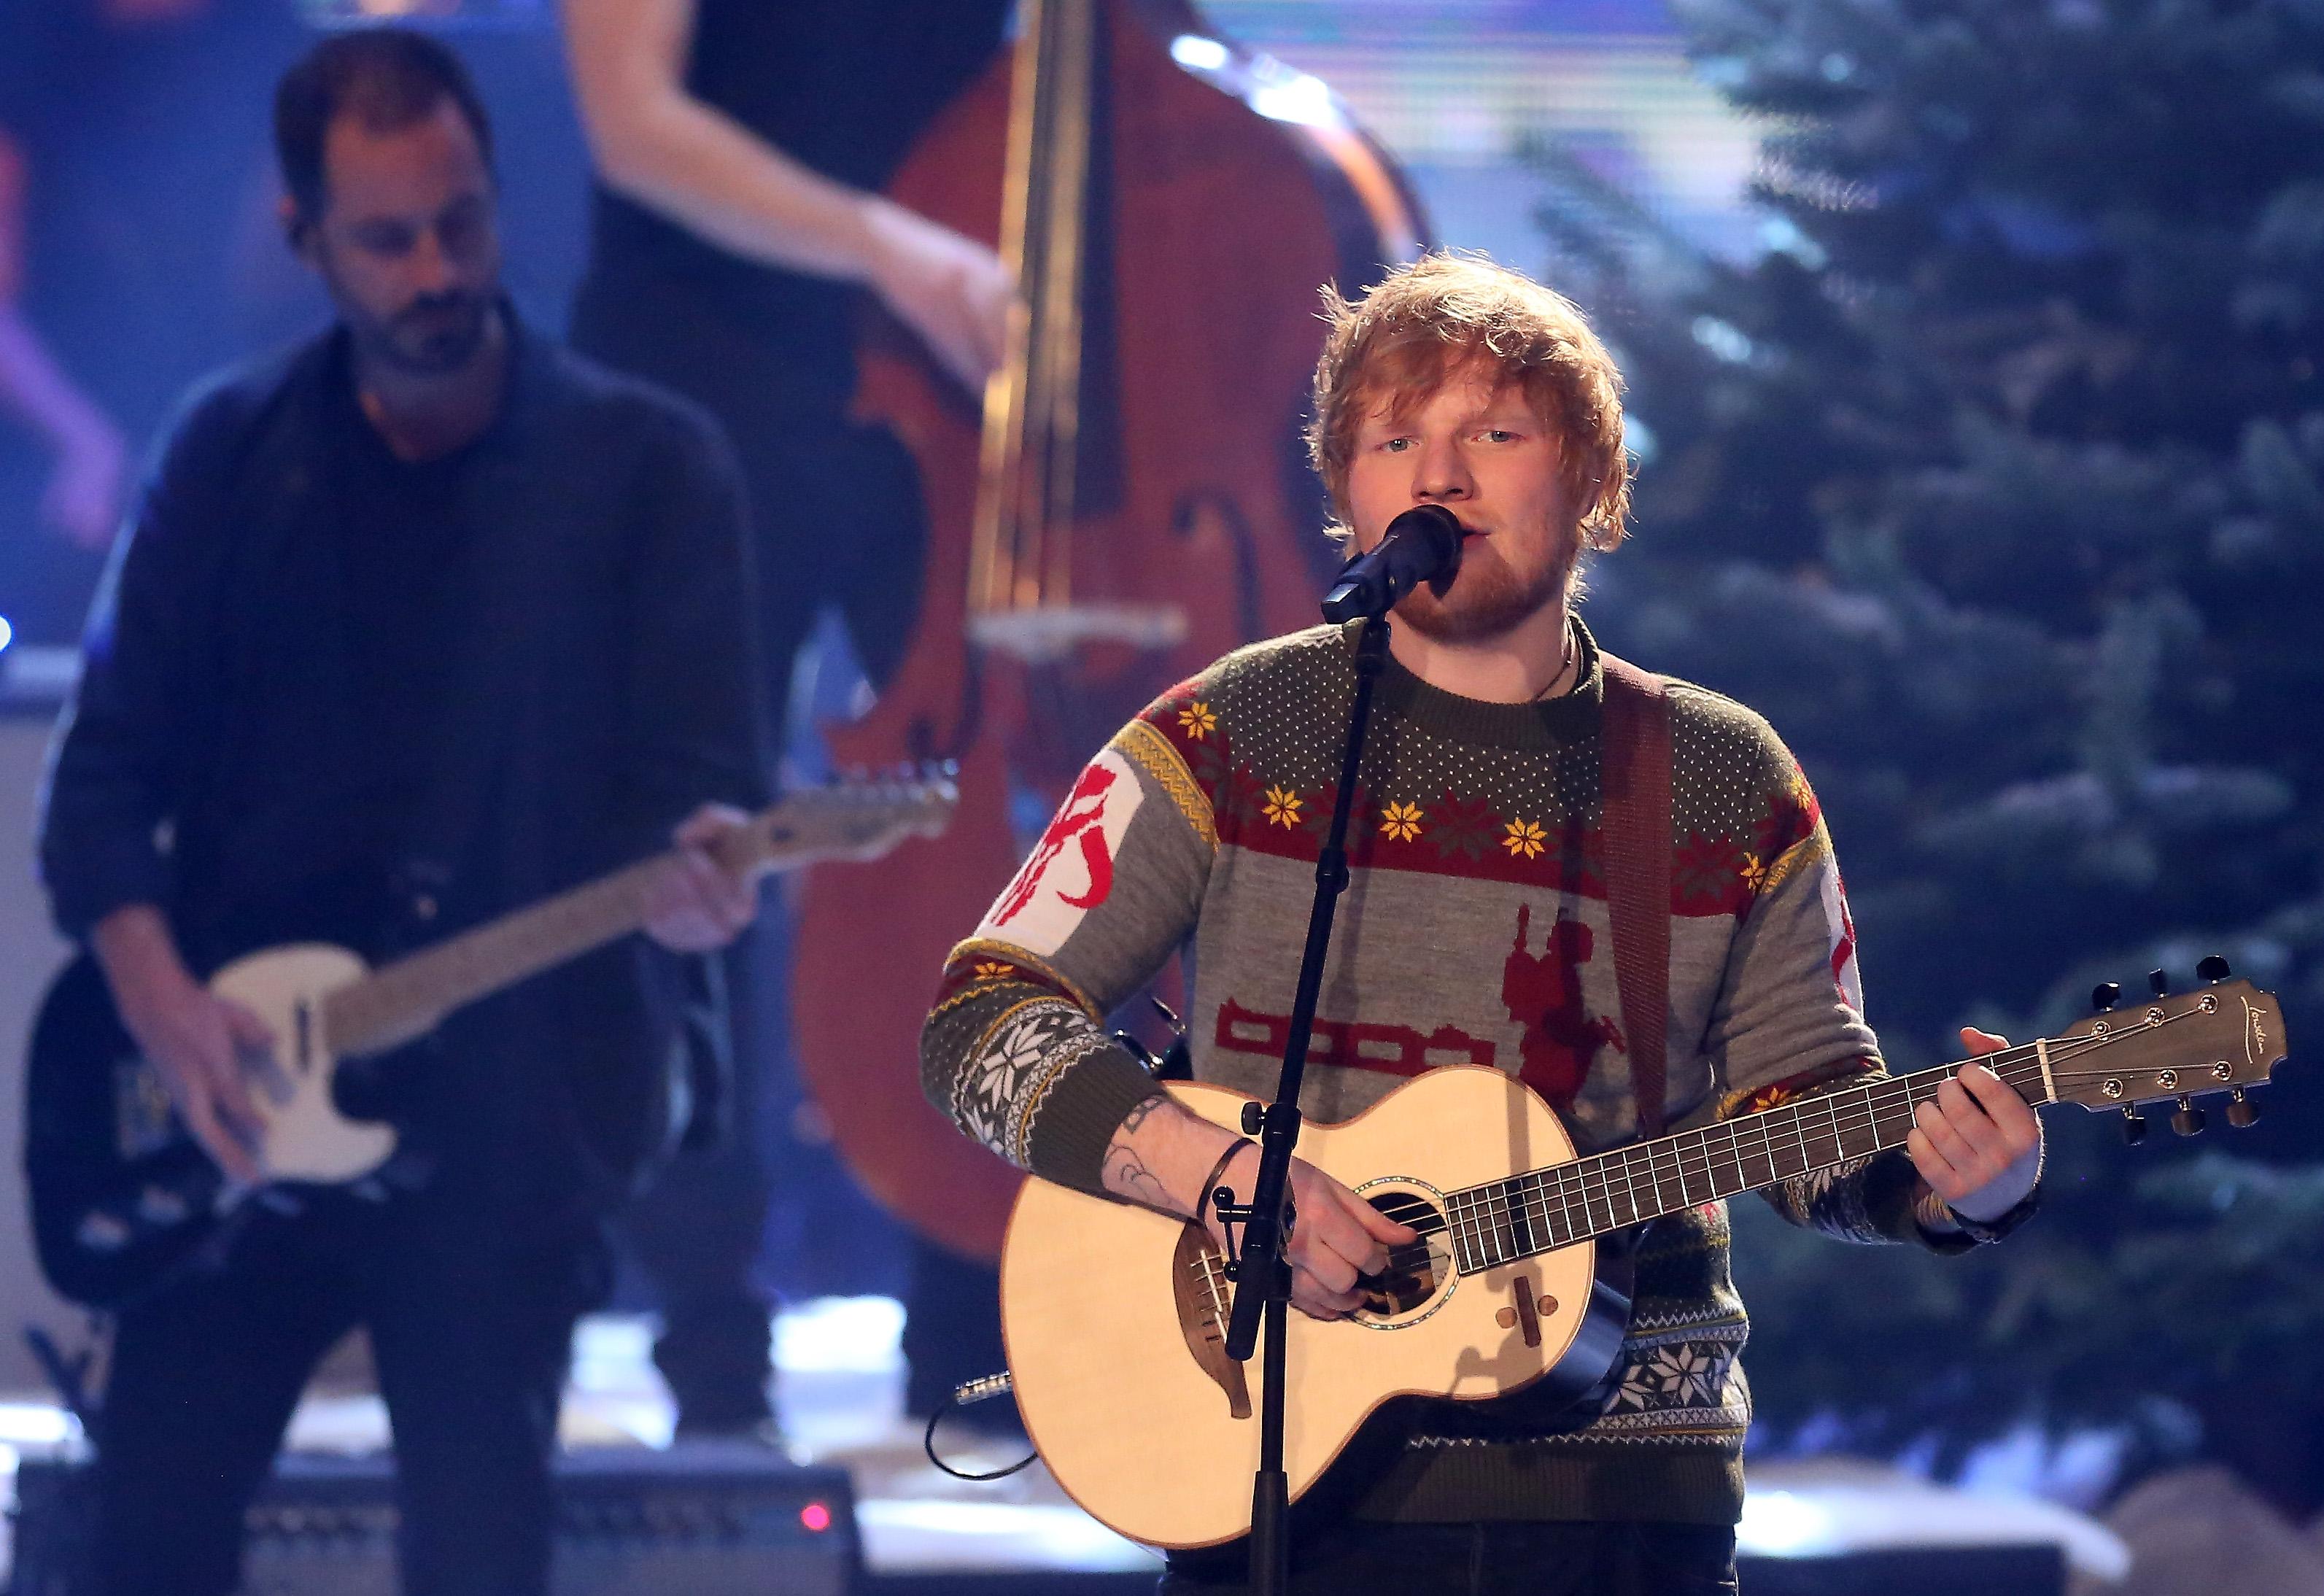 Ed Sheeran at The Voice of Germany finals, Berlin, 2017